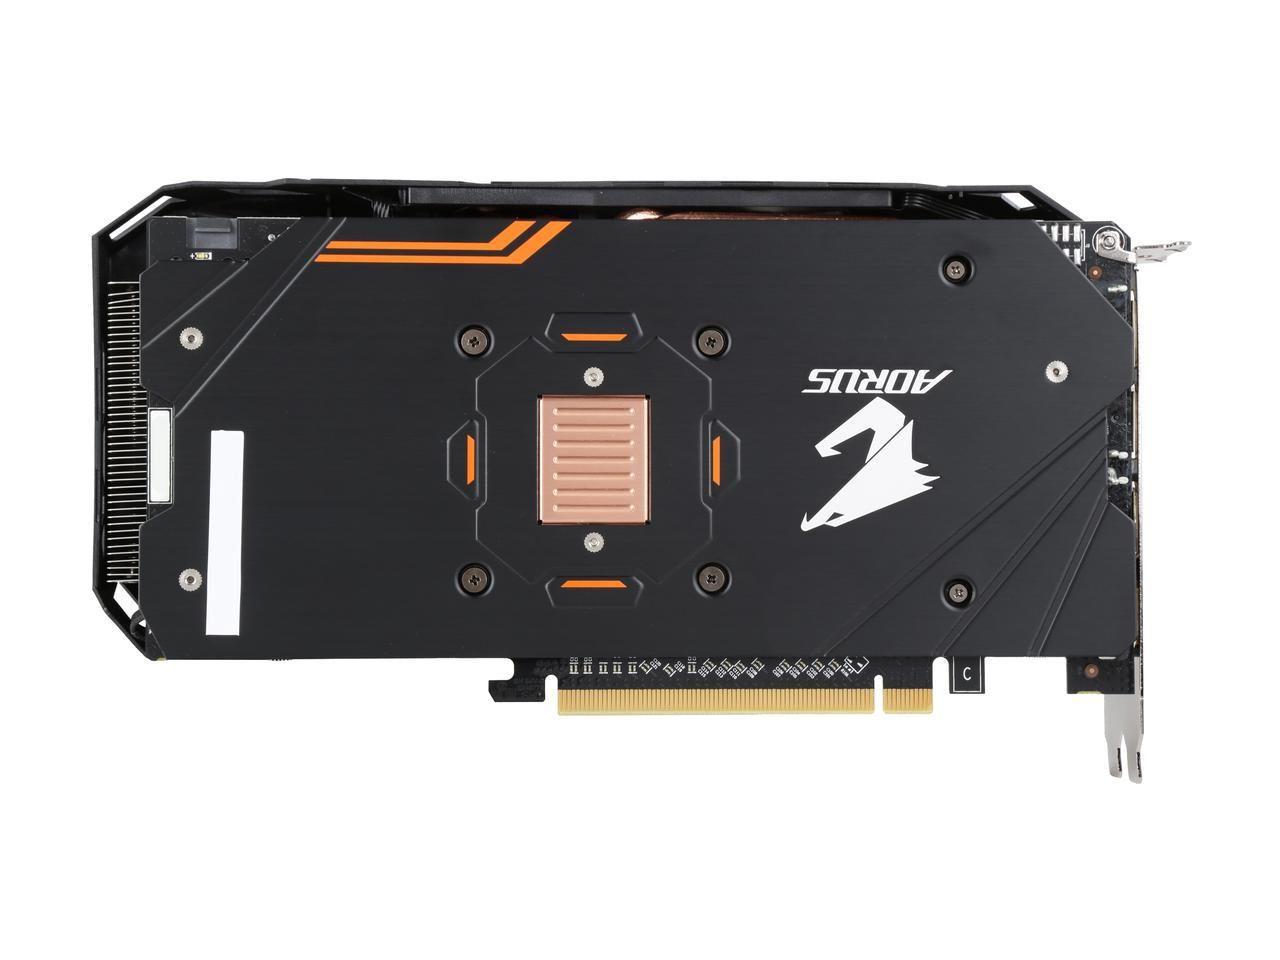 Buy GIGABYTE AORUS Radeon RX 580 DirectX 12 GV-RX580AORUS